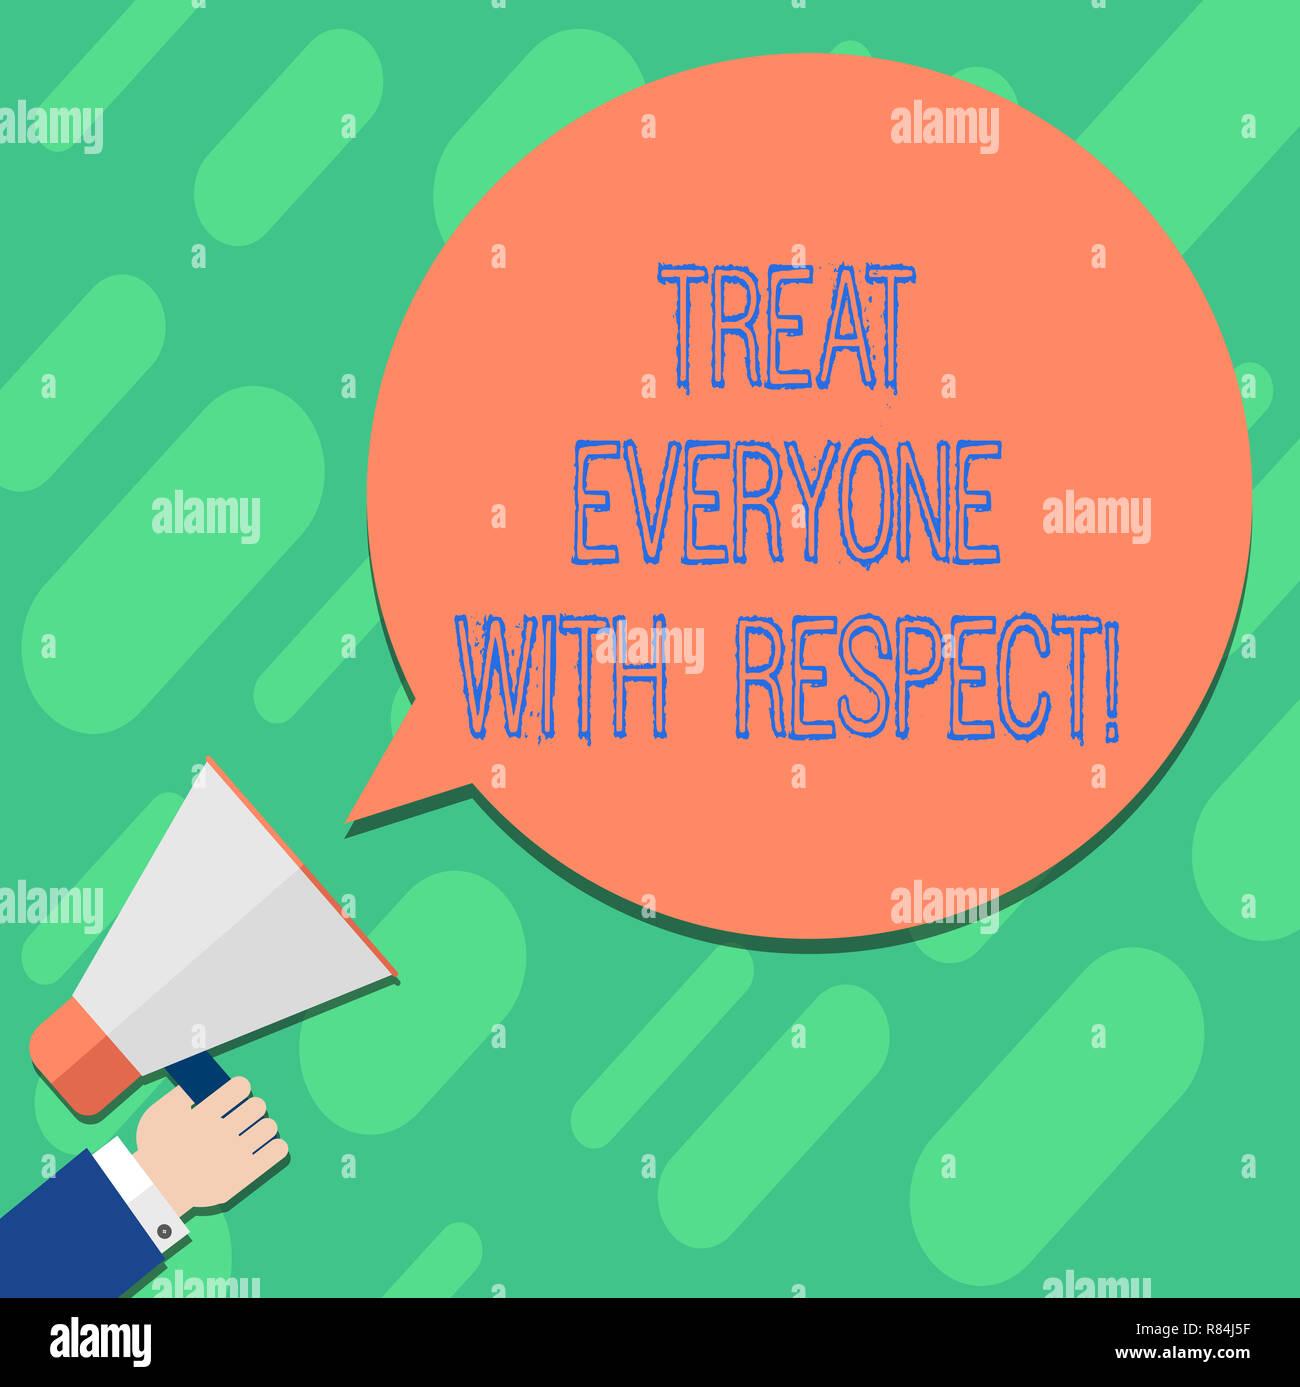 respect value definition